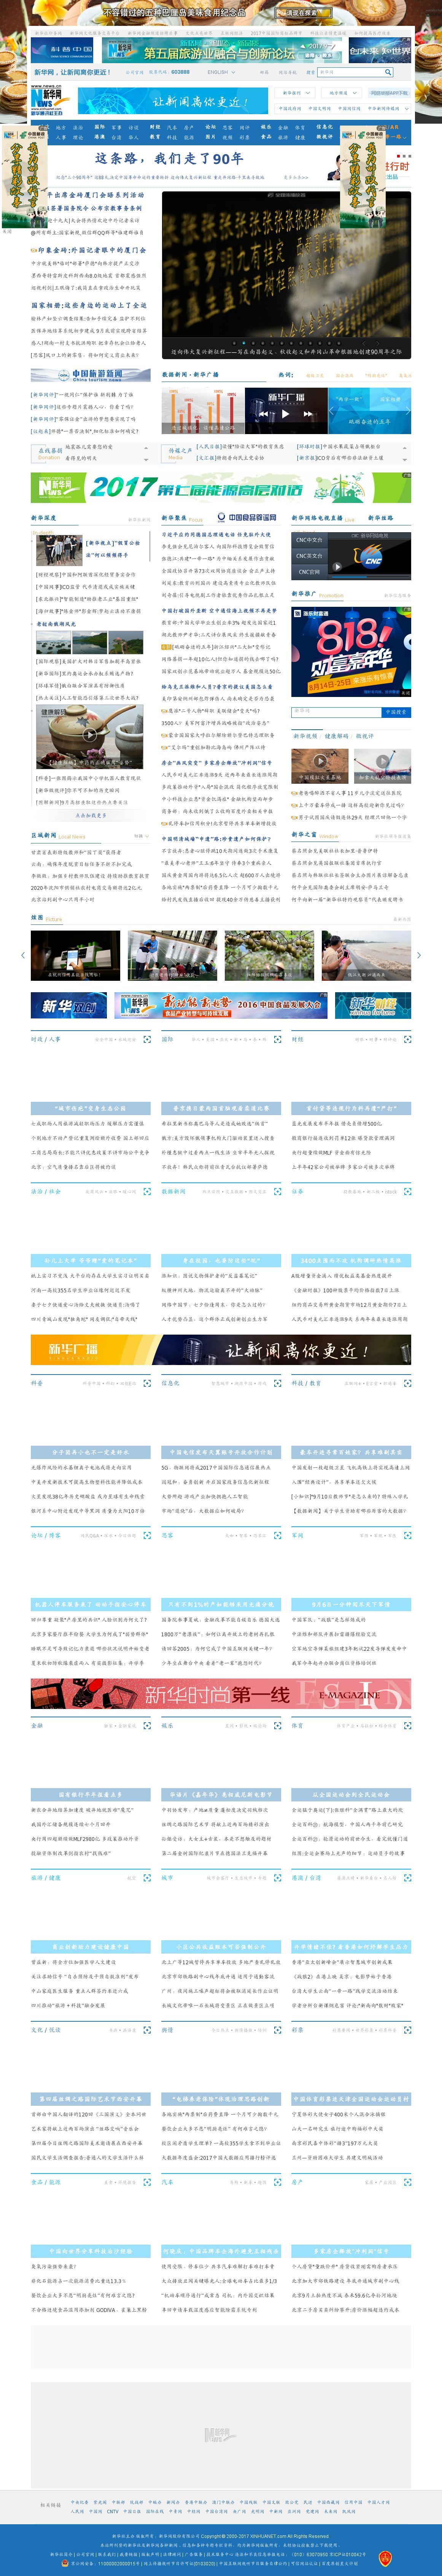 Xinhua at Friday Sept. 8, 2017, 6:24 a.m. UTC